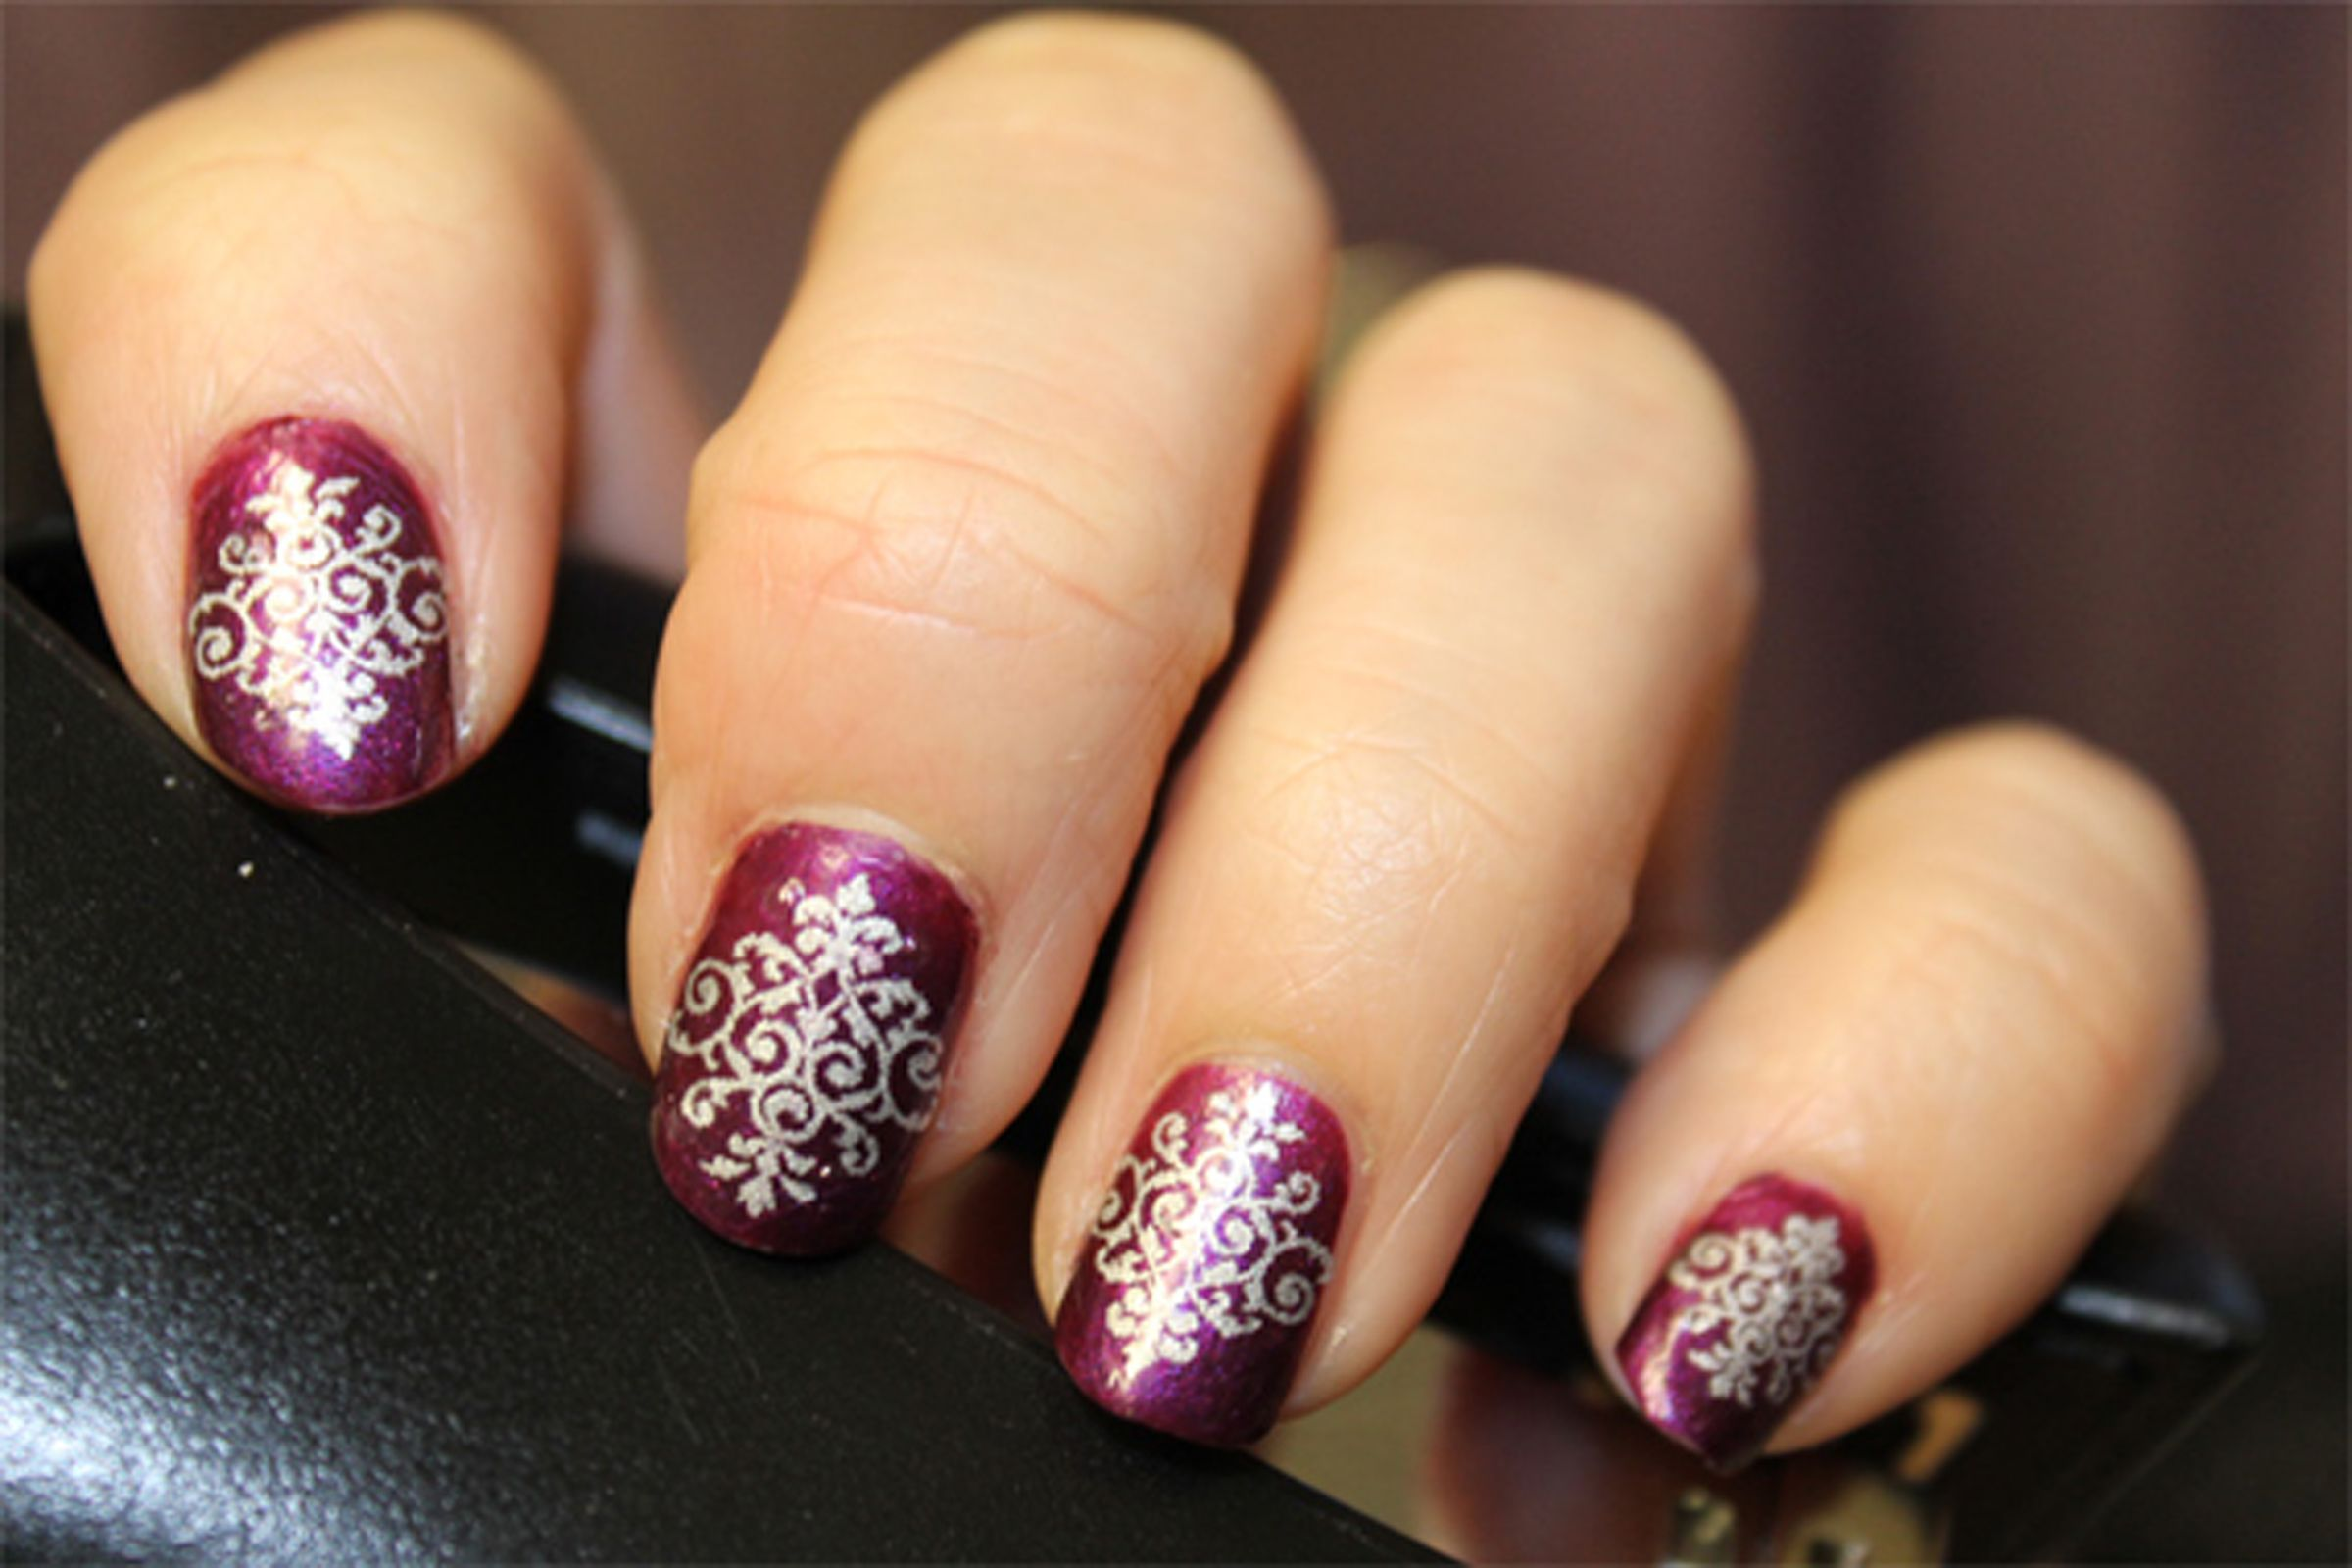 SILVER LACE DAMASK Nail Art Decals (DMS)   Hair, Nails, Makeup ...